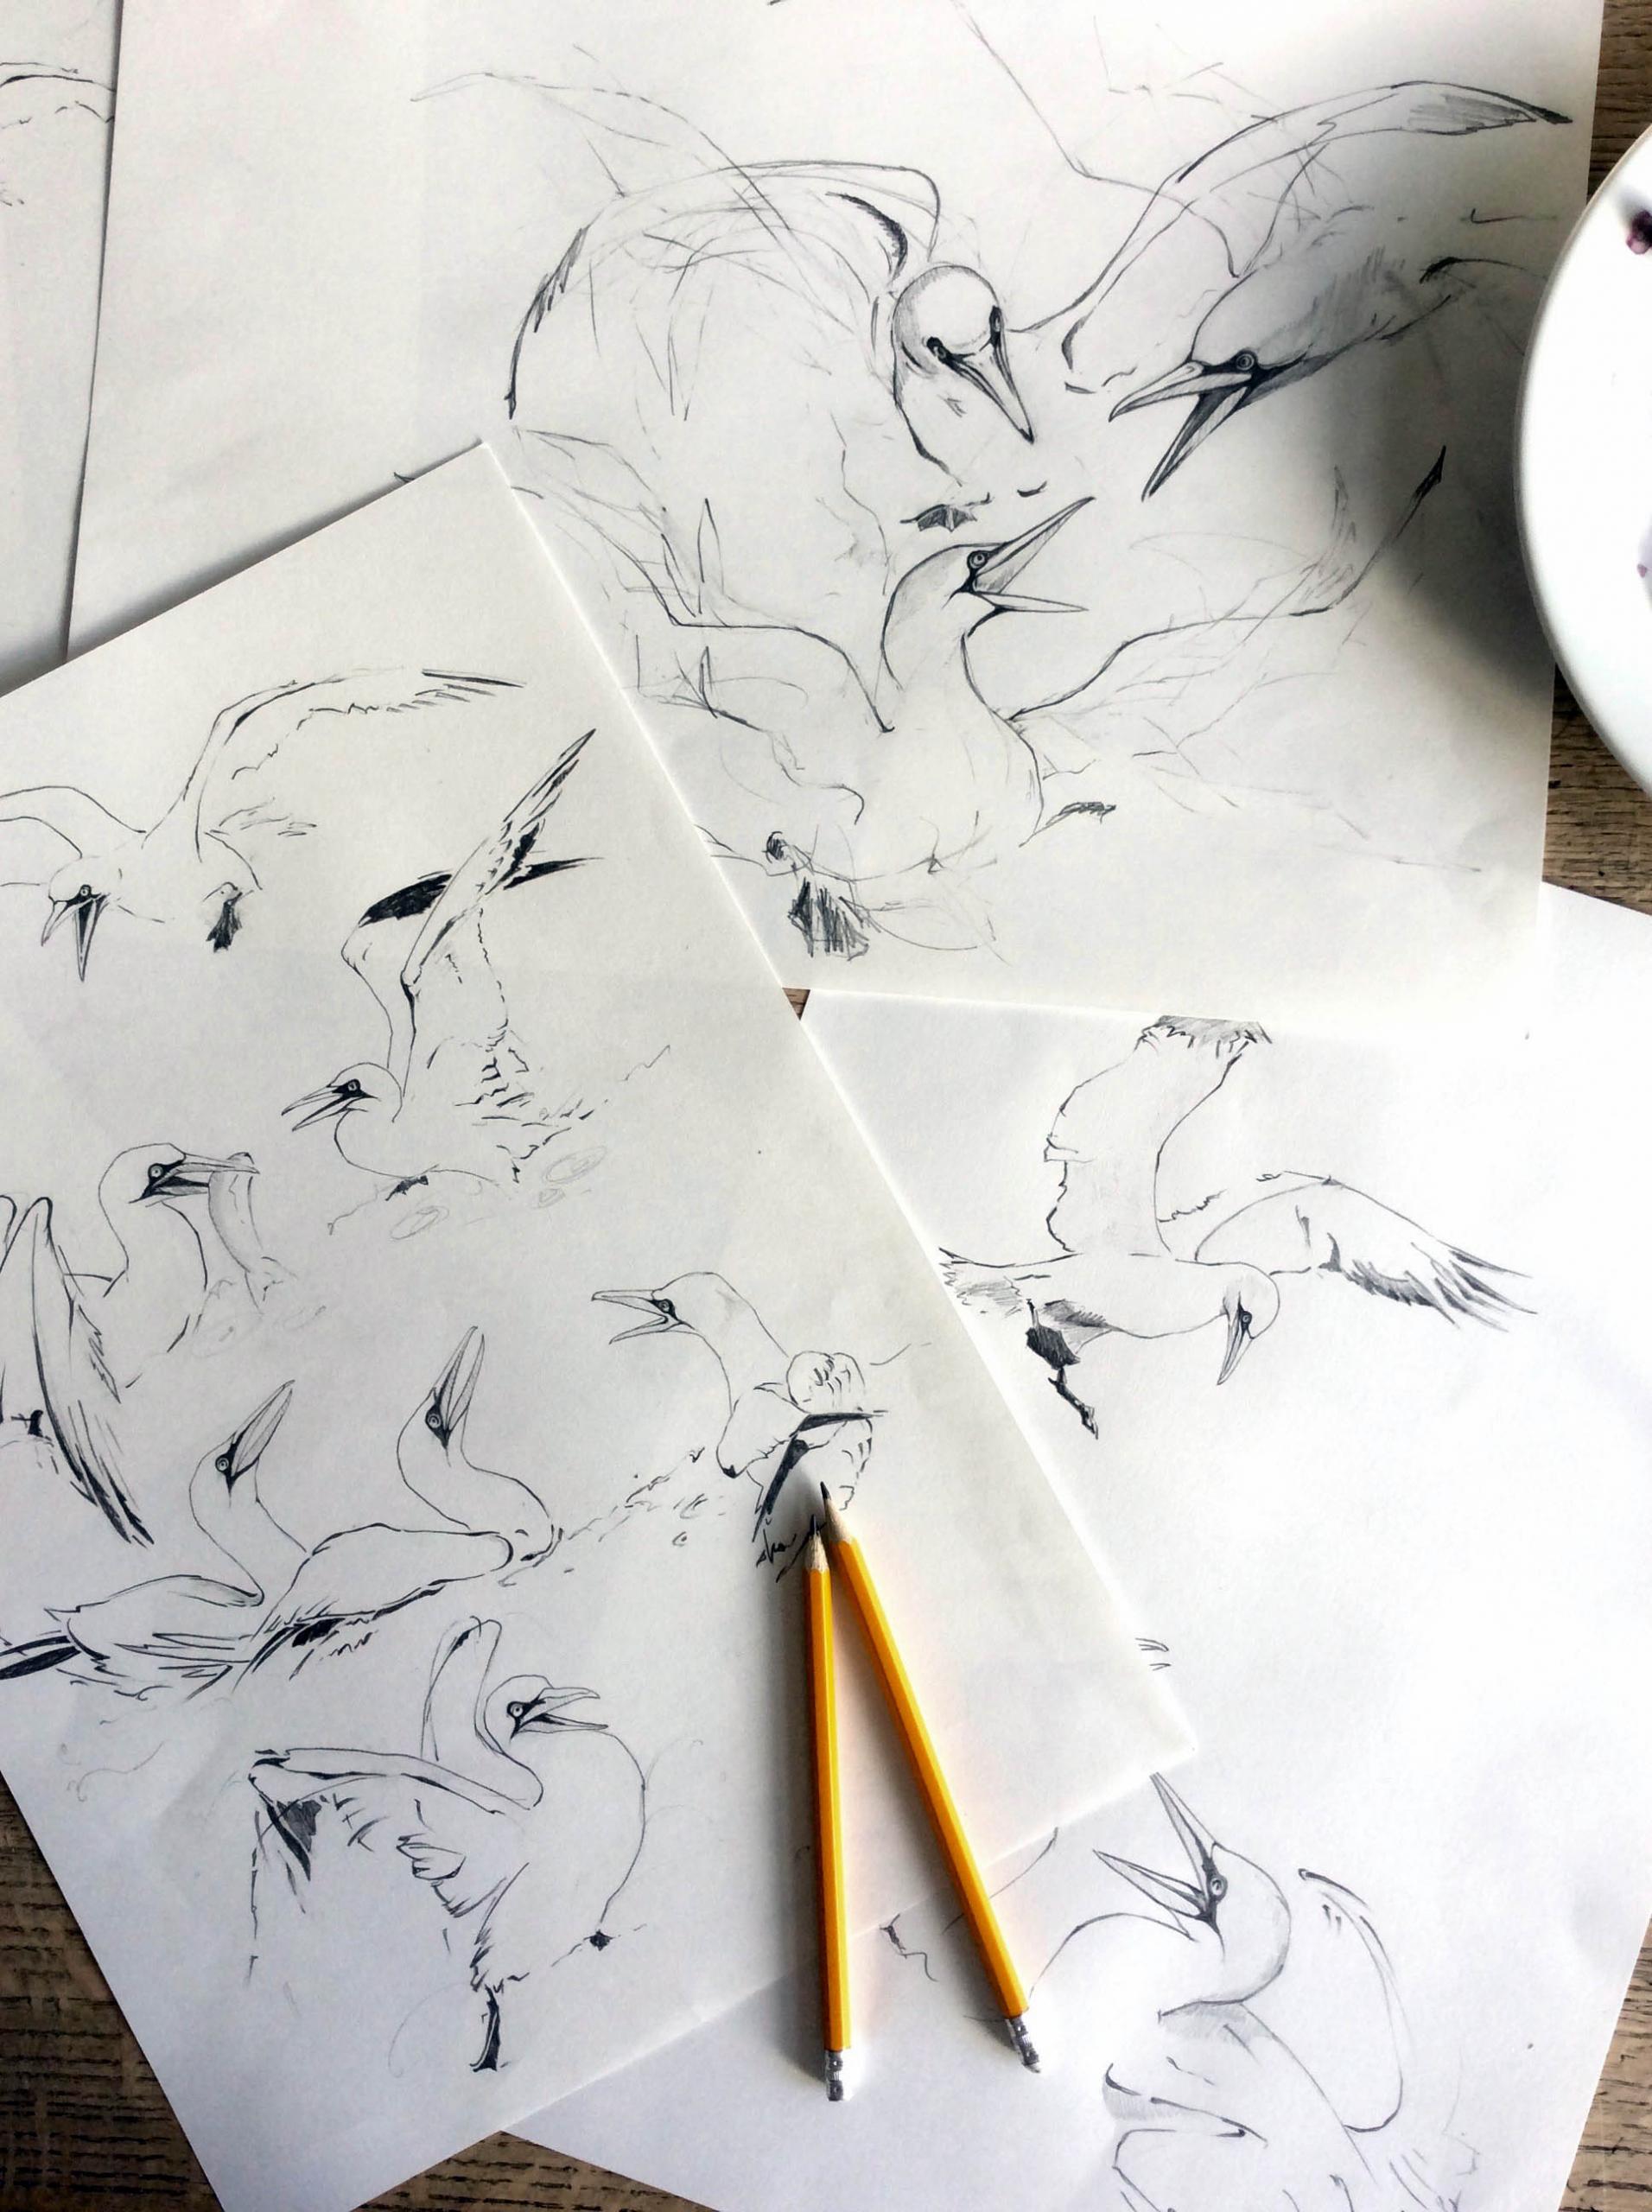 gannet drawings